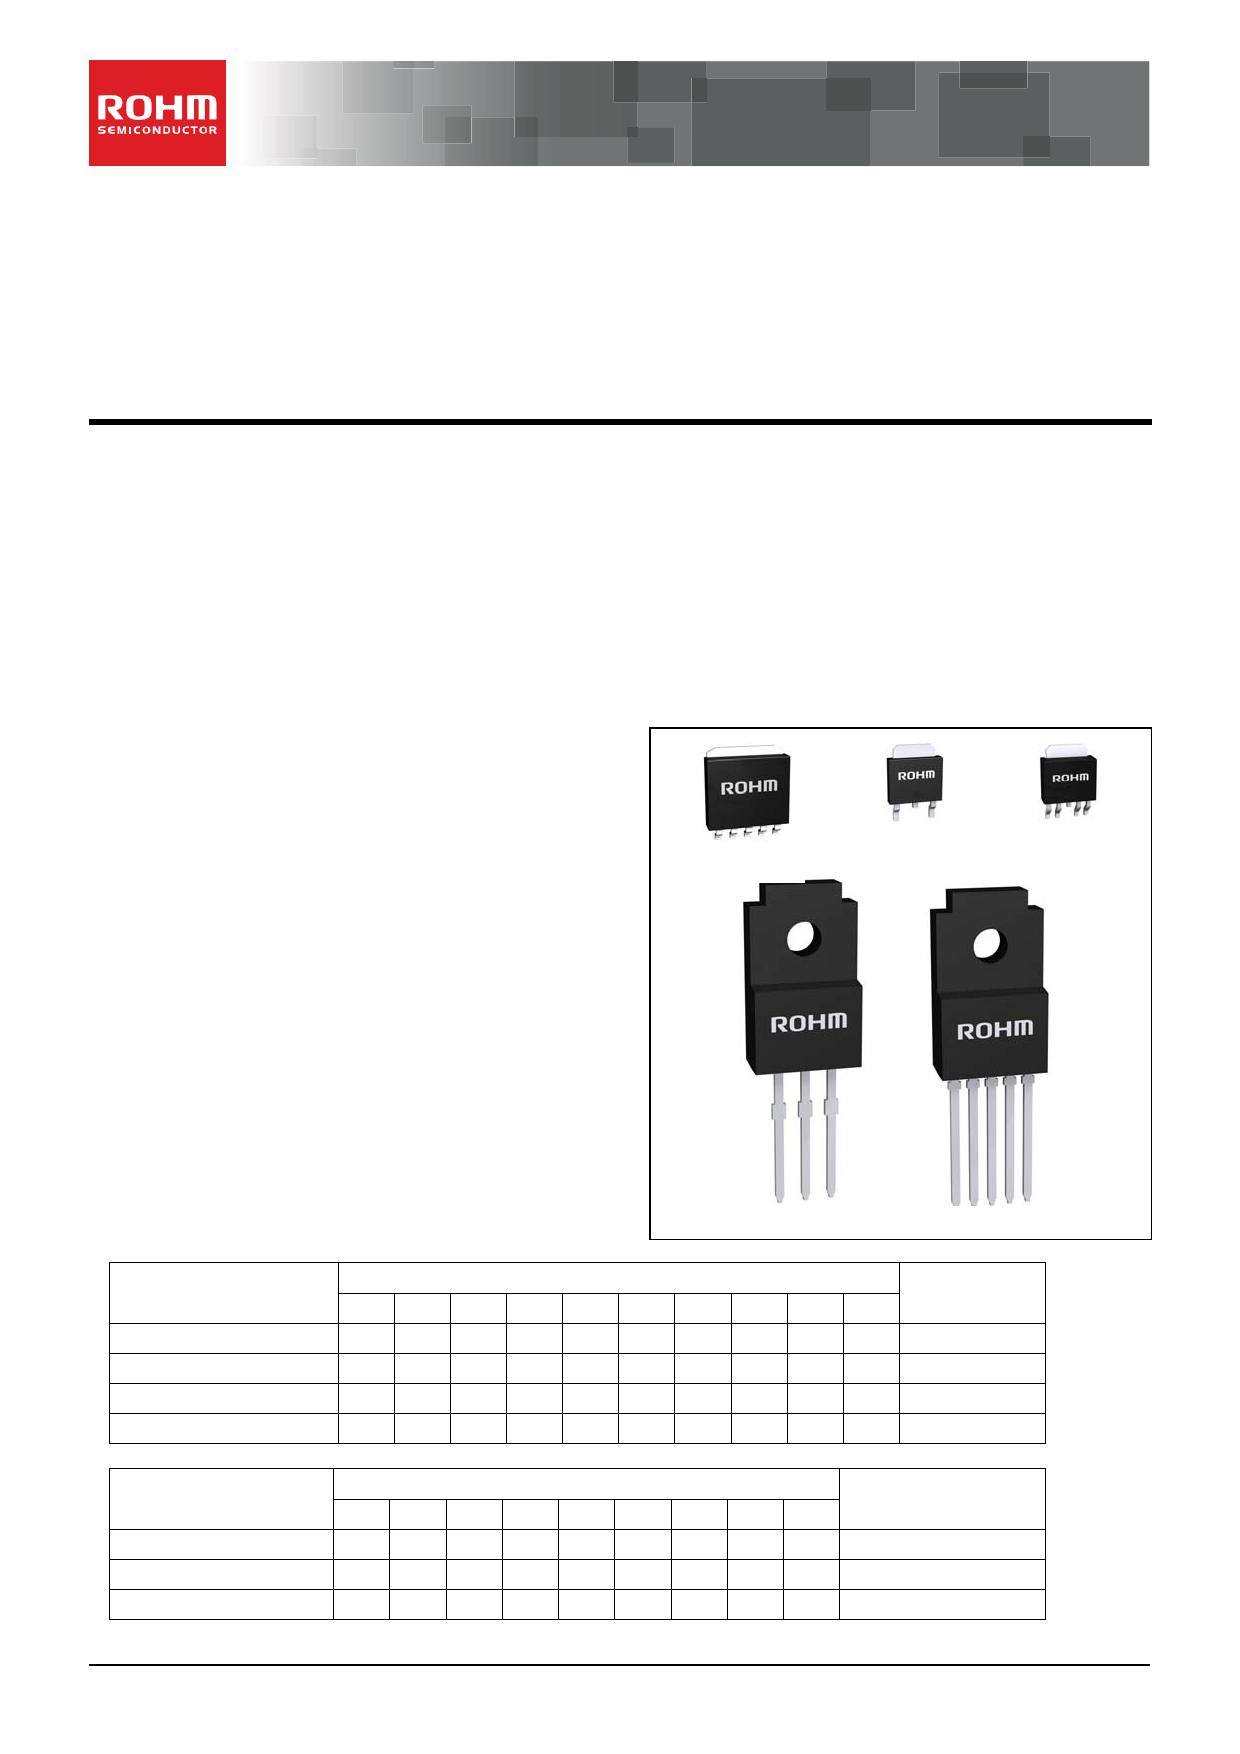 BA033CC0T datasheet